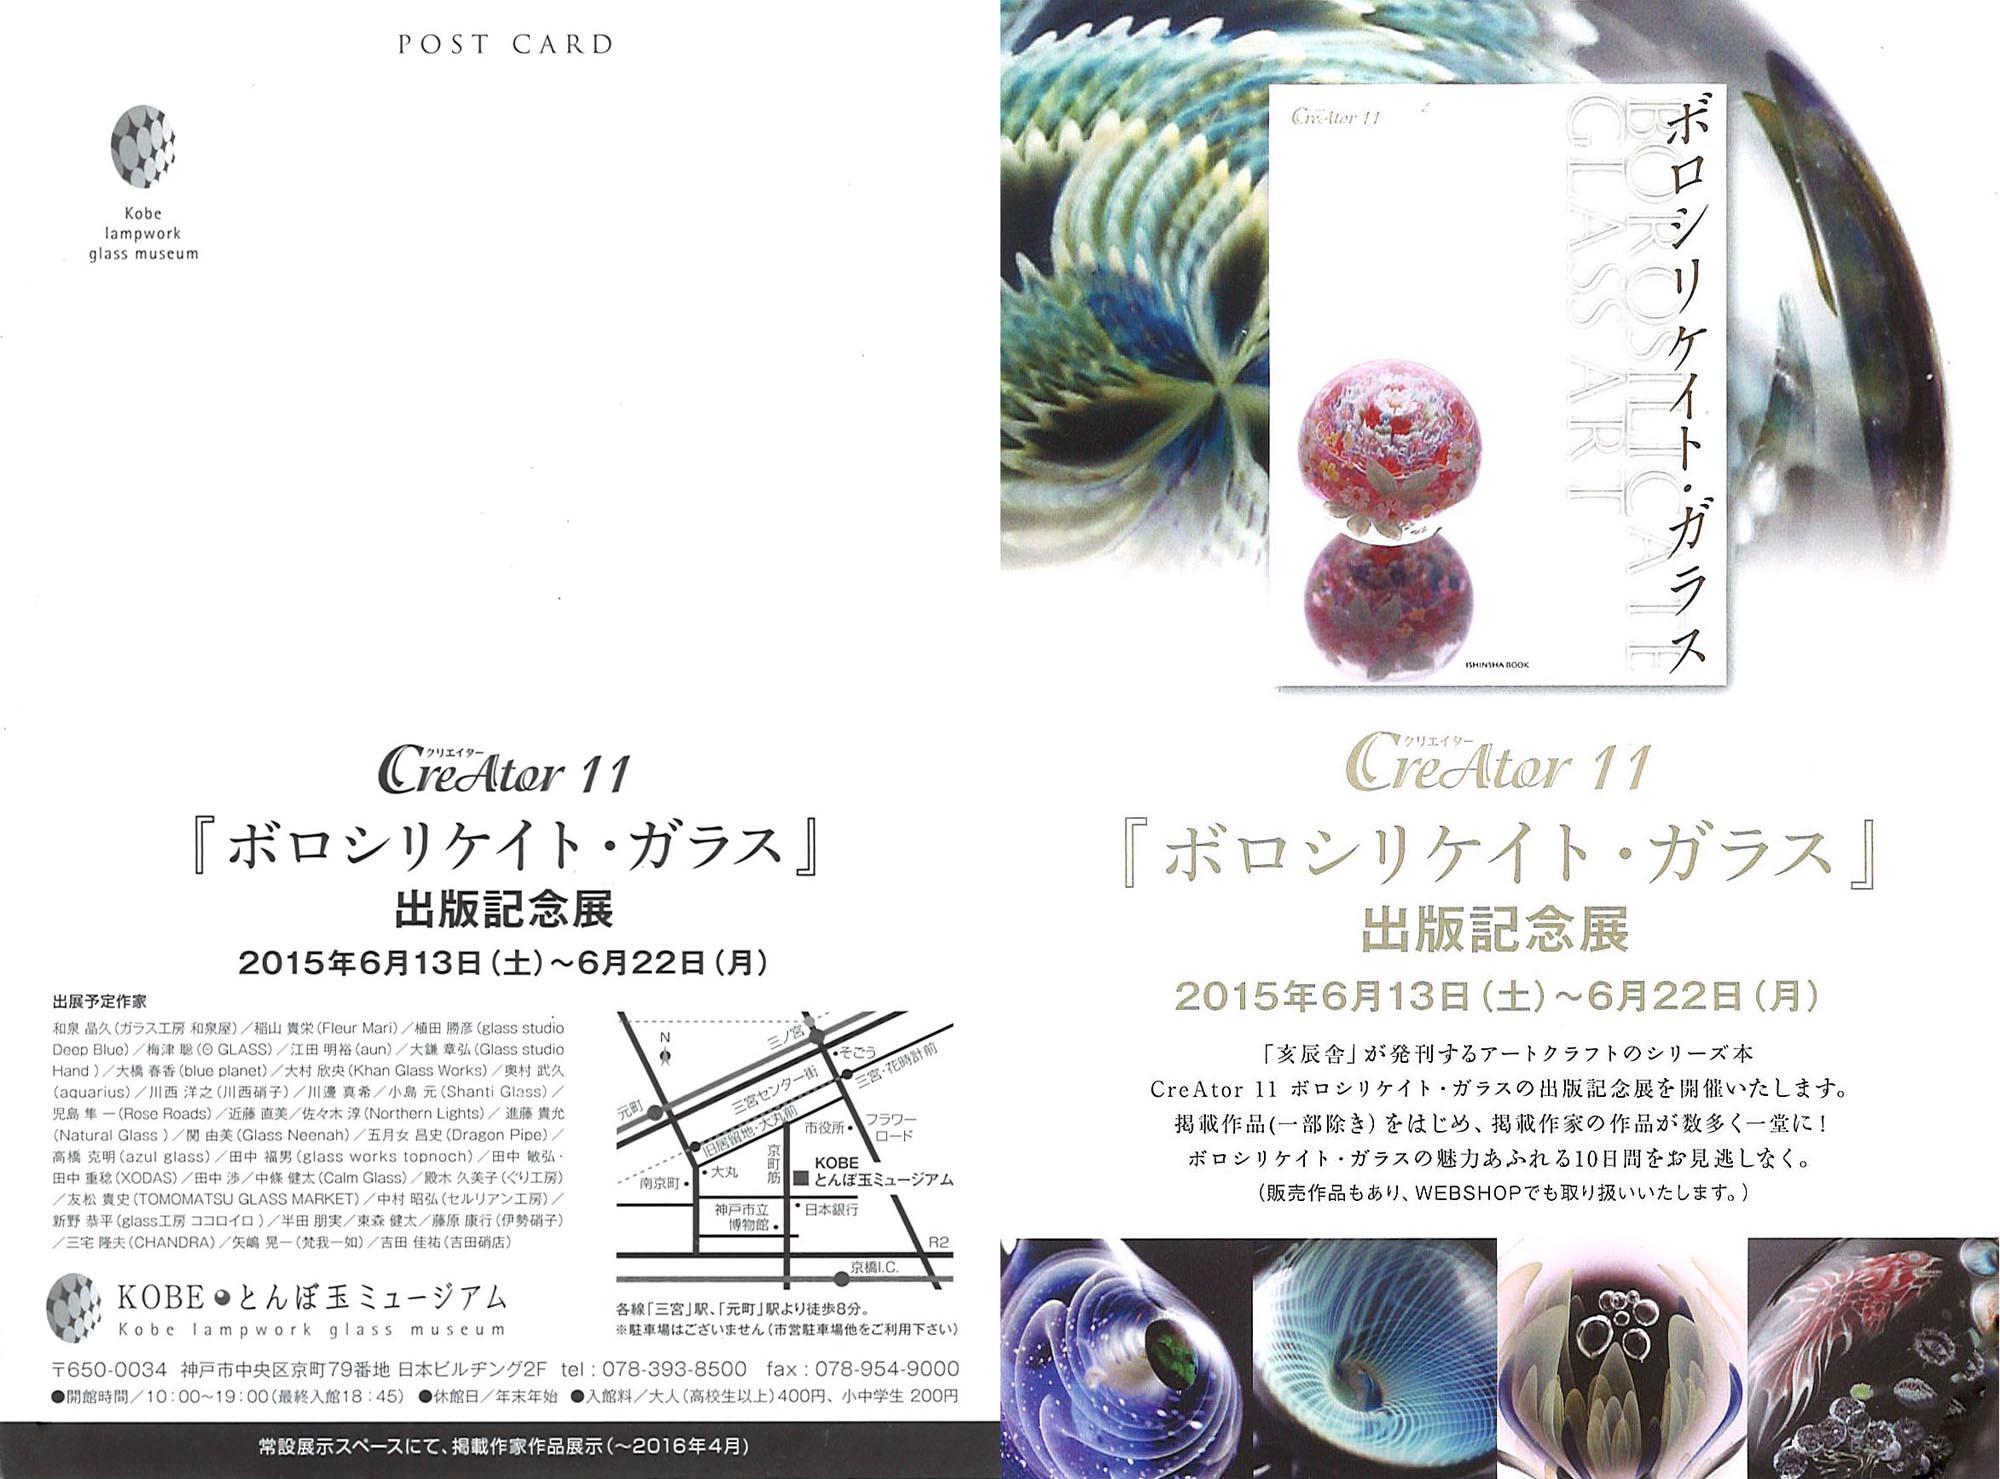 CreAtor11「ボロシリケイト・ガラス」出版記念展